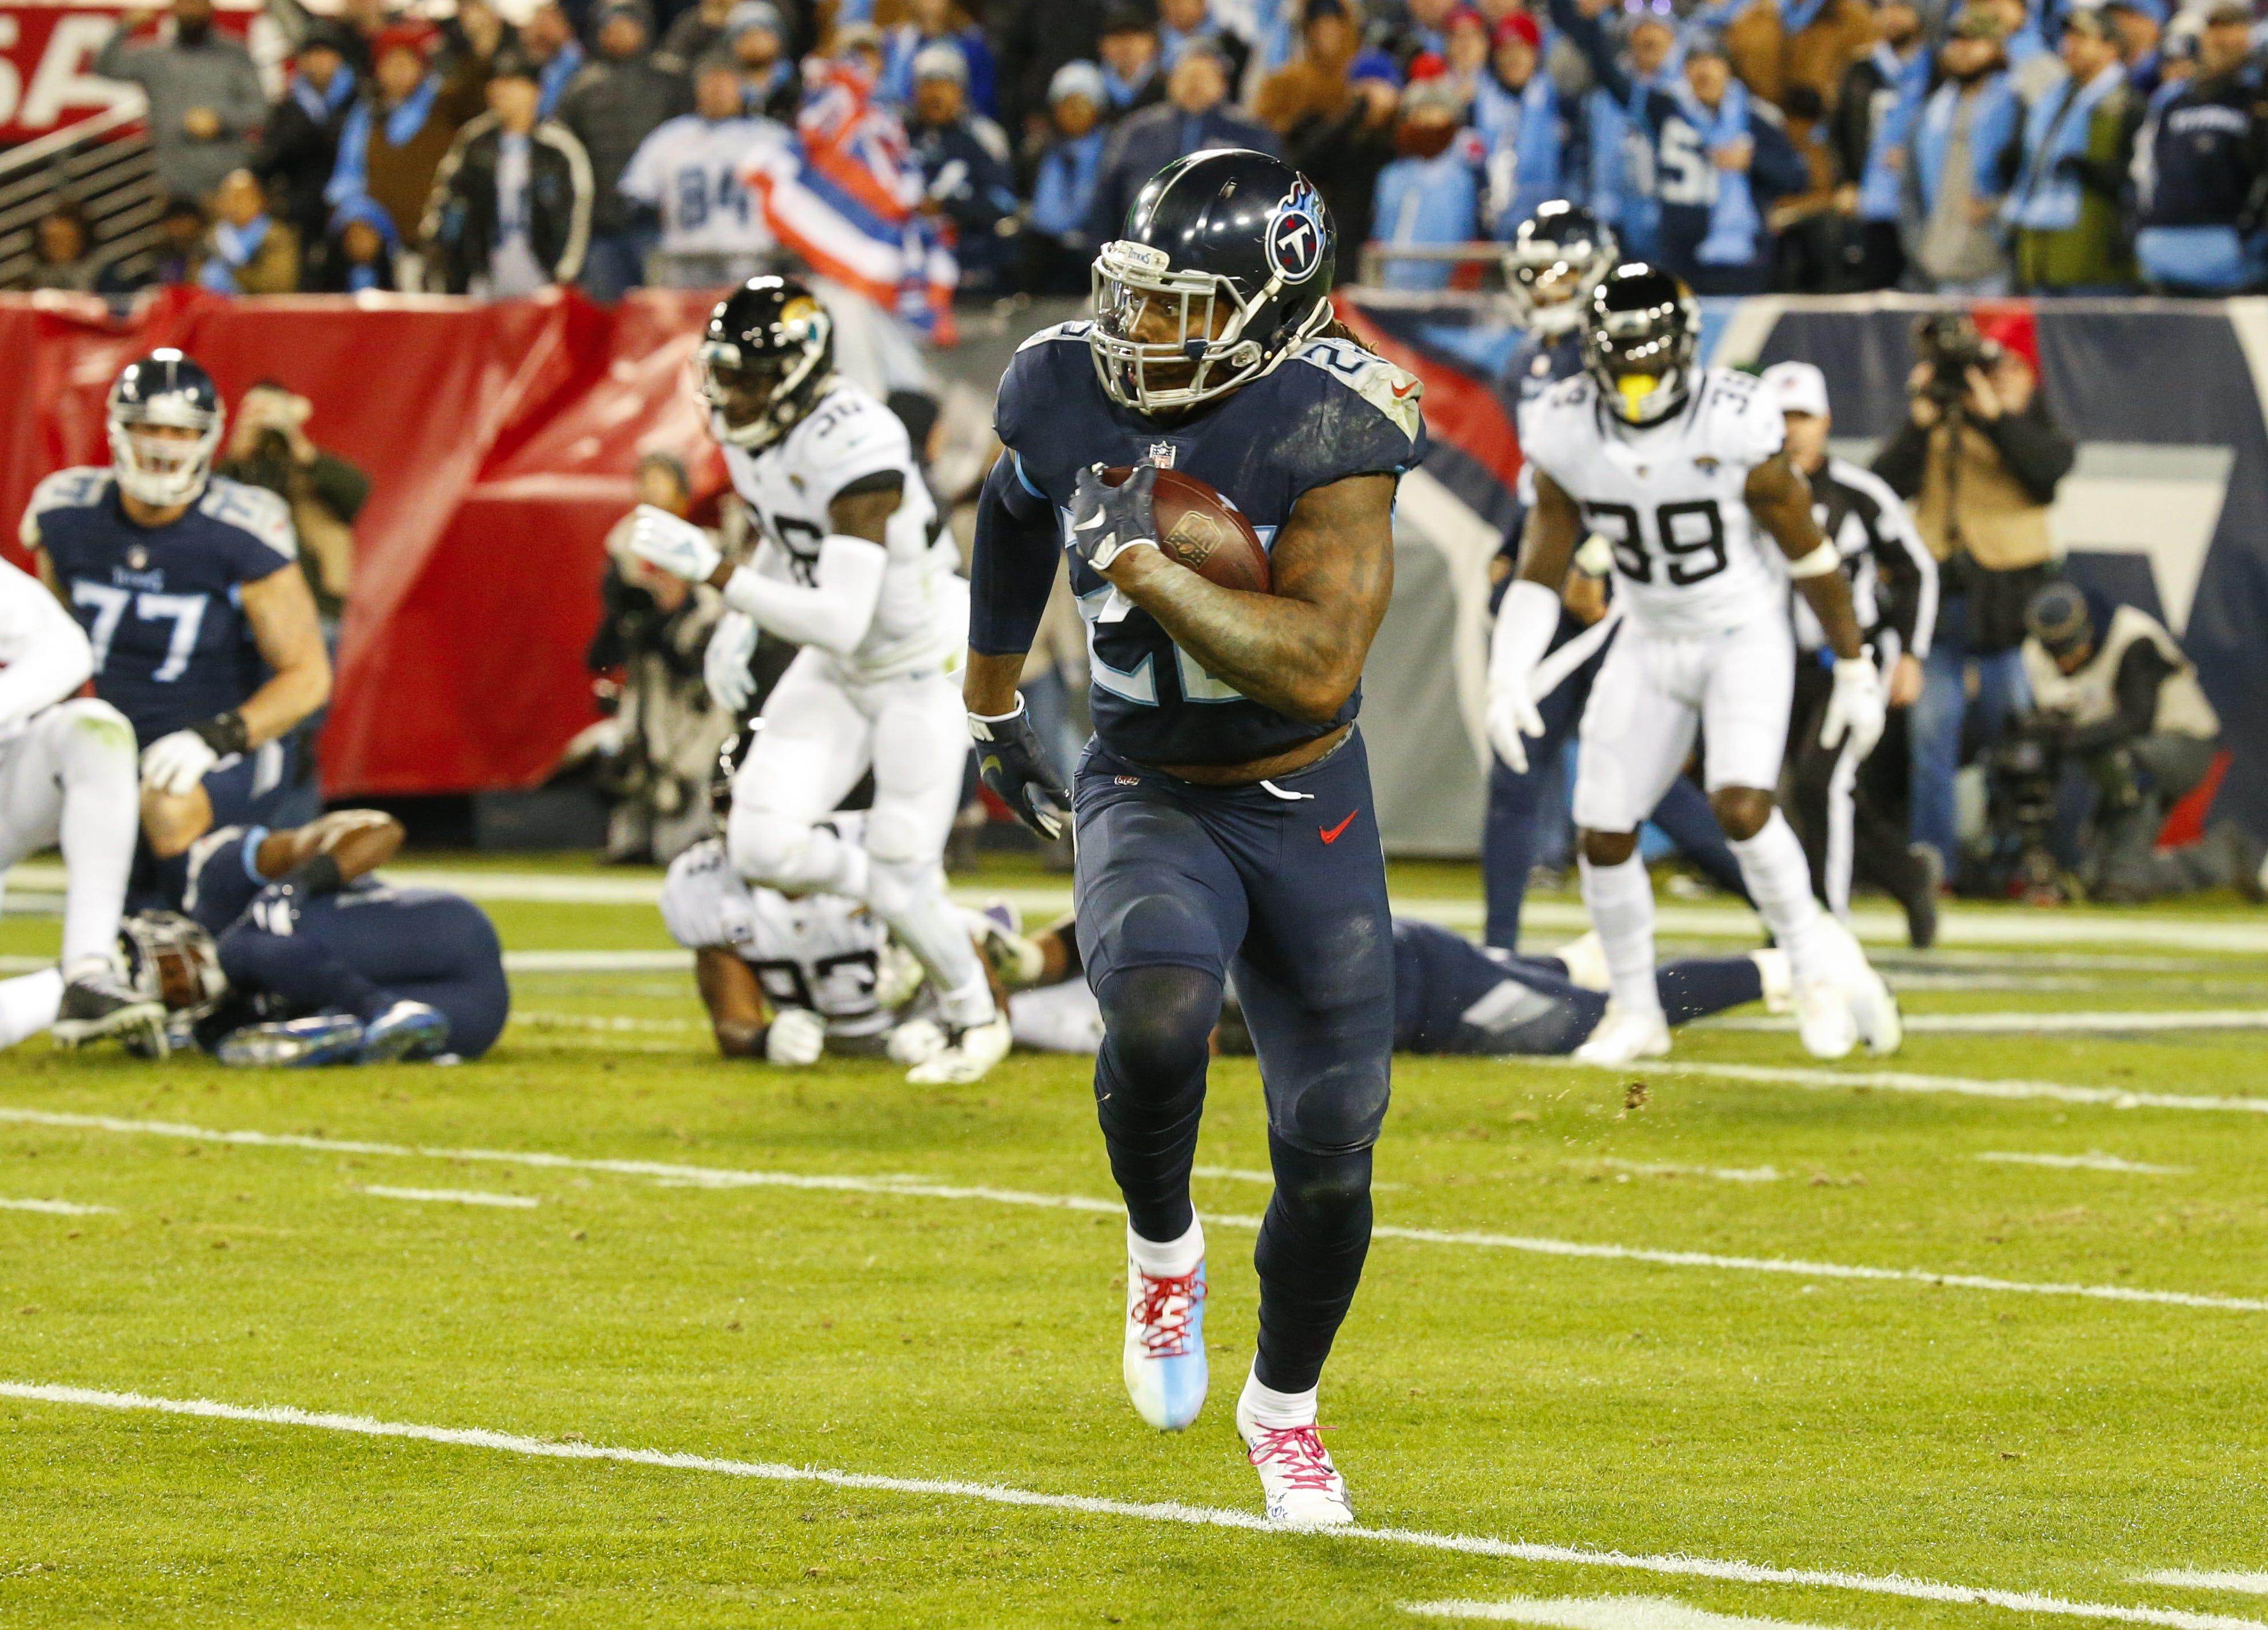 Derrick Henry ties Tony Dorsett's NFL record with 99-yard TD run vs. Jaguars